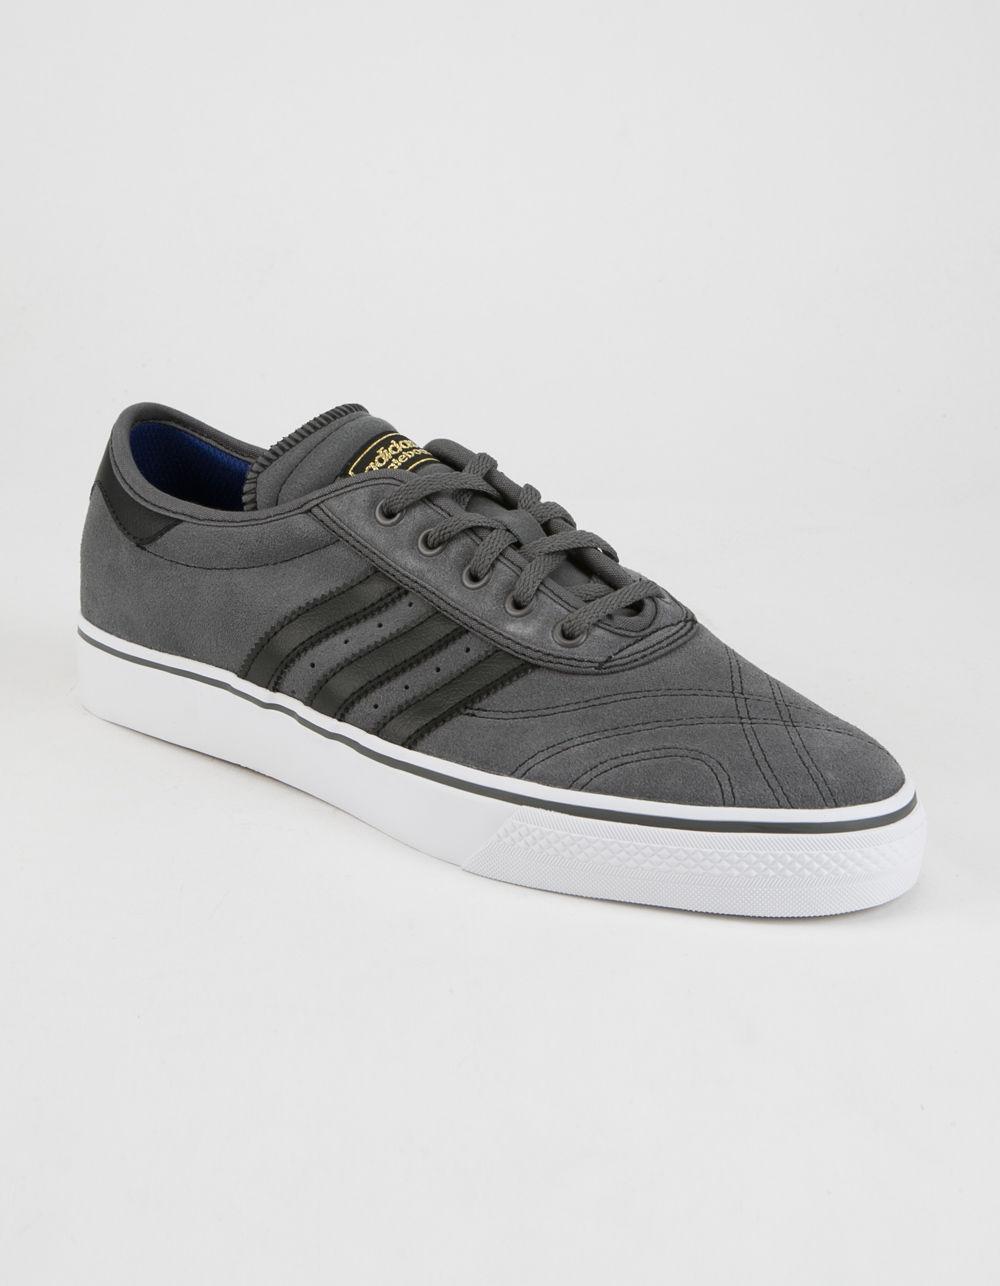 watch 5140e beb94 adidas-GREY-Adi-ease-Premiere-Grey-Mens-Shoes.jpeg